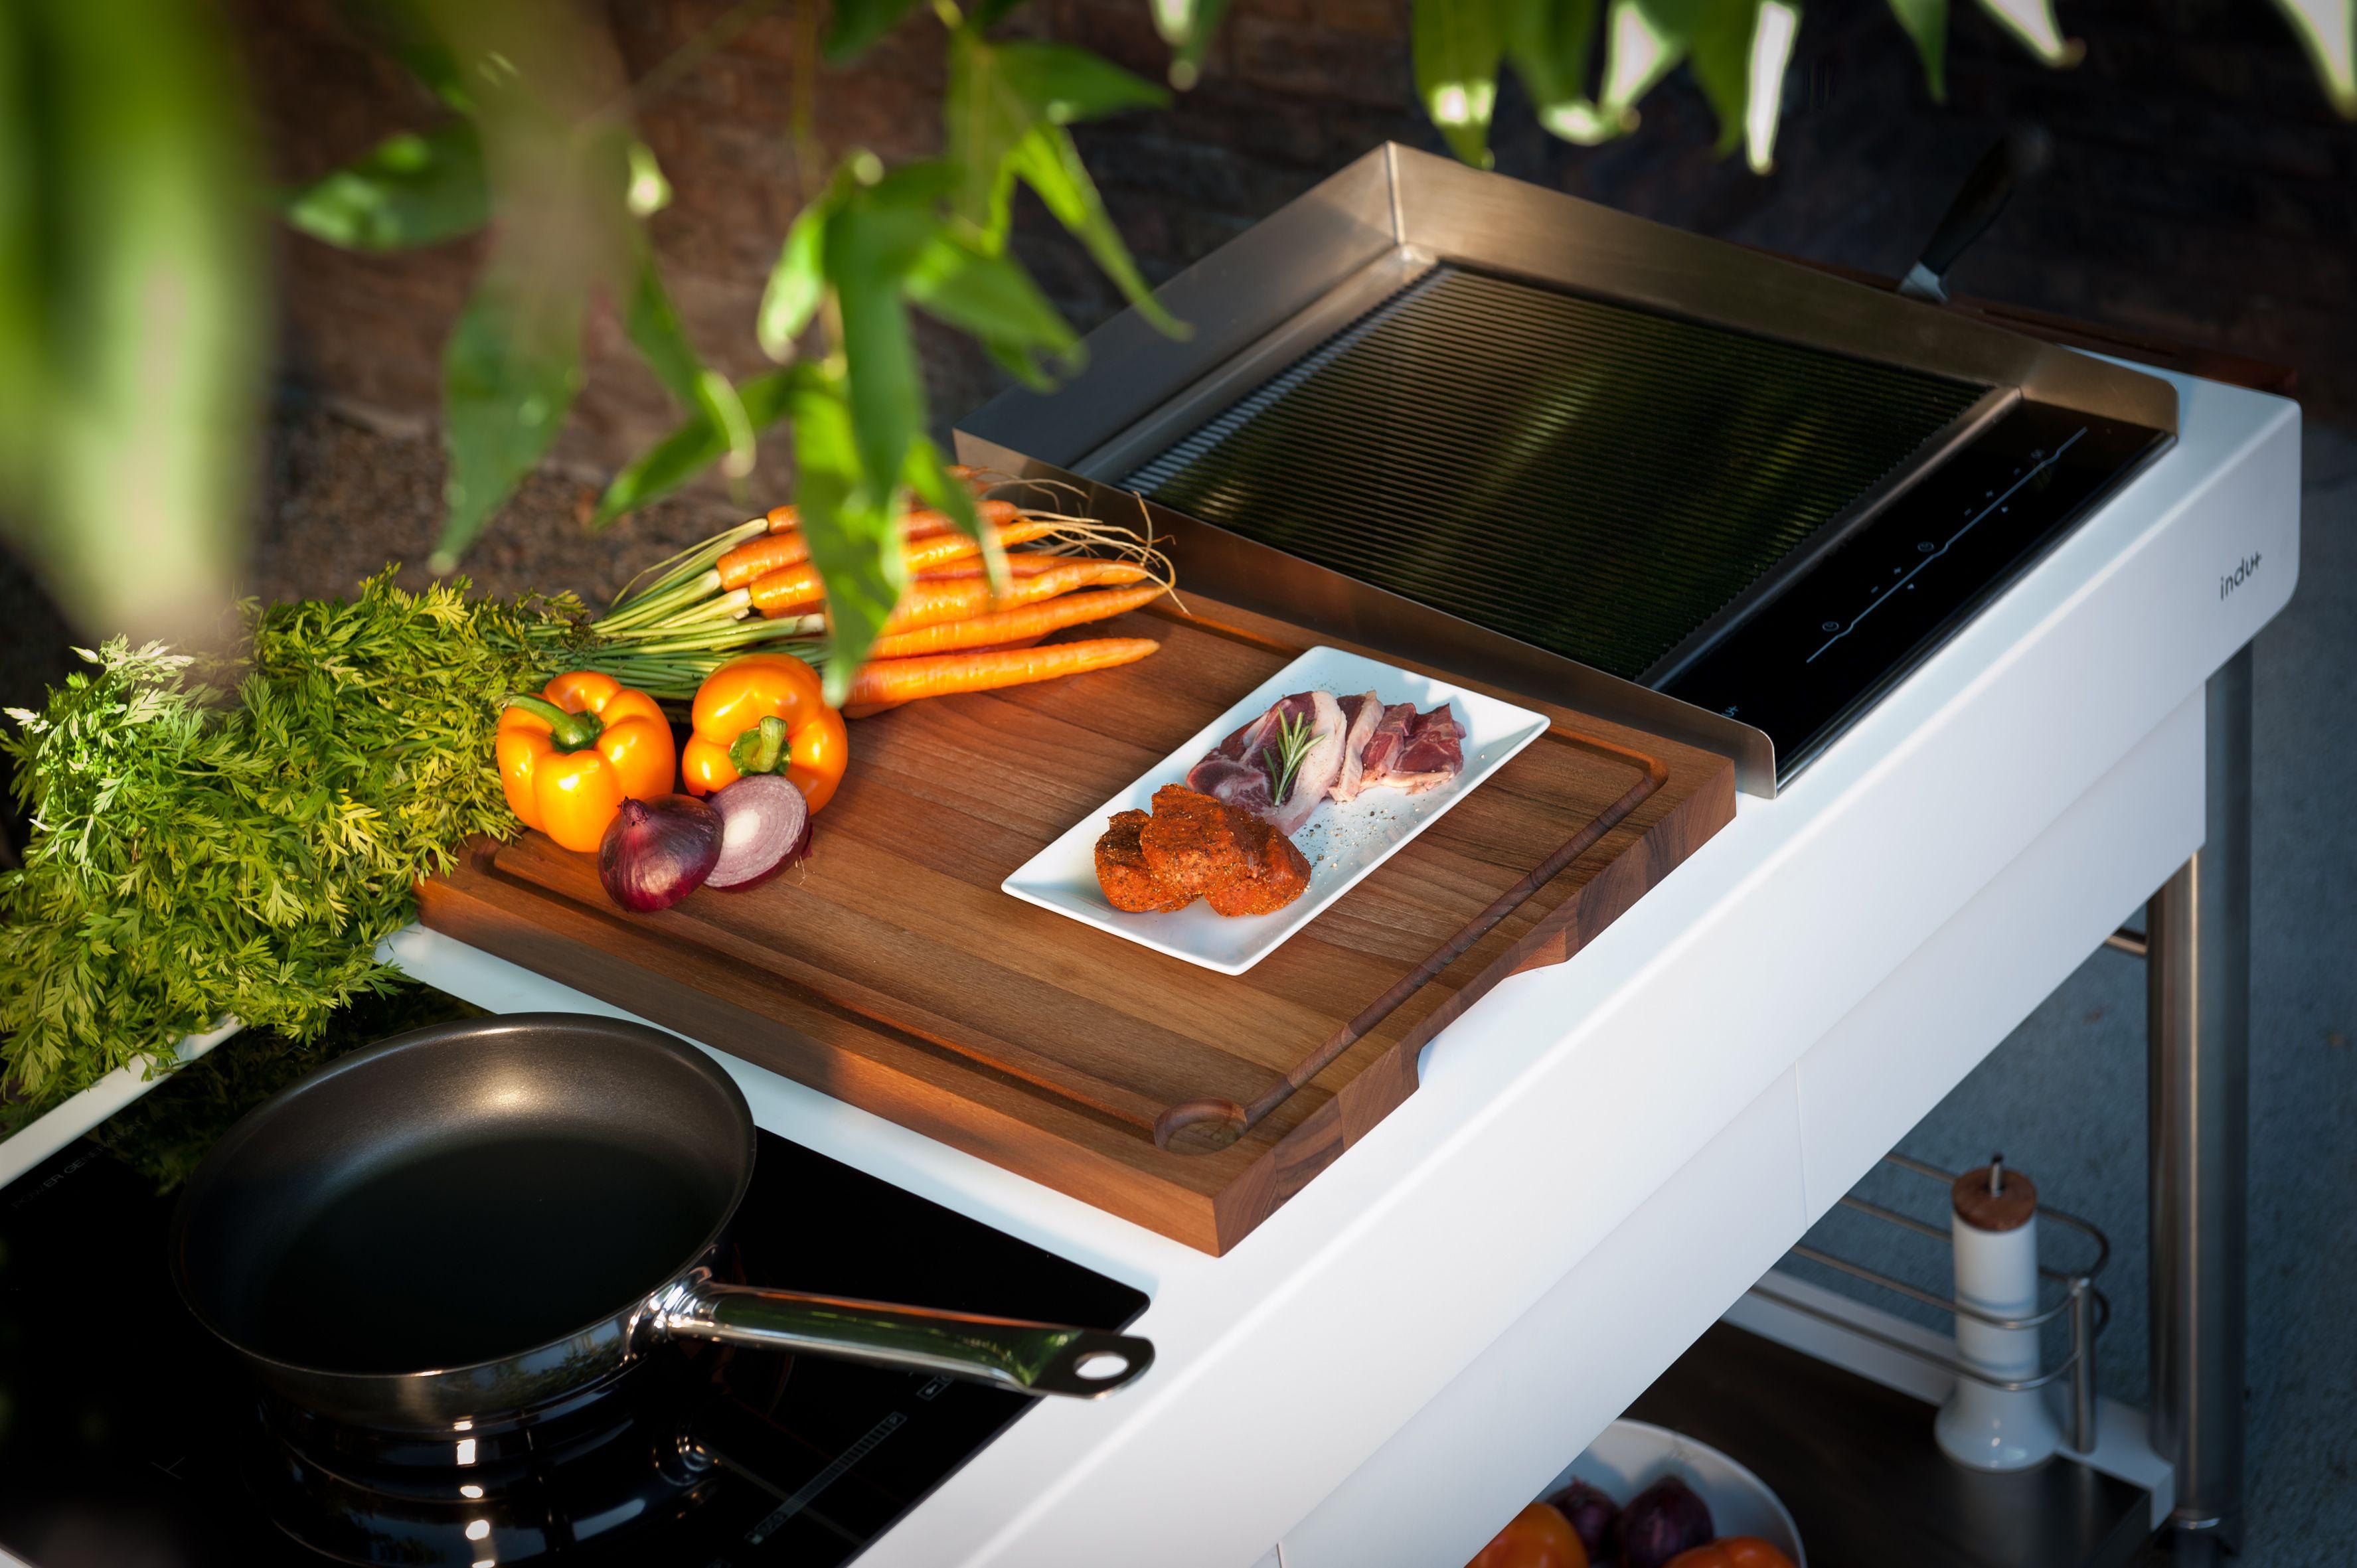 Outdoorküche Gas Xiaomi : Mobile outdoor küche von move nous pourrions avoir besoin d aide